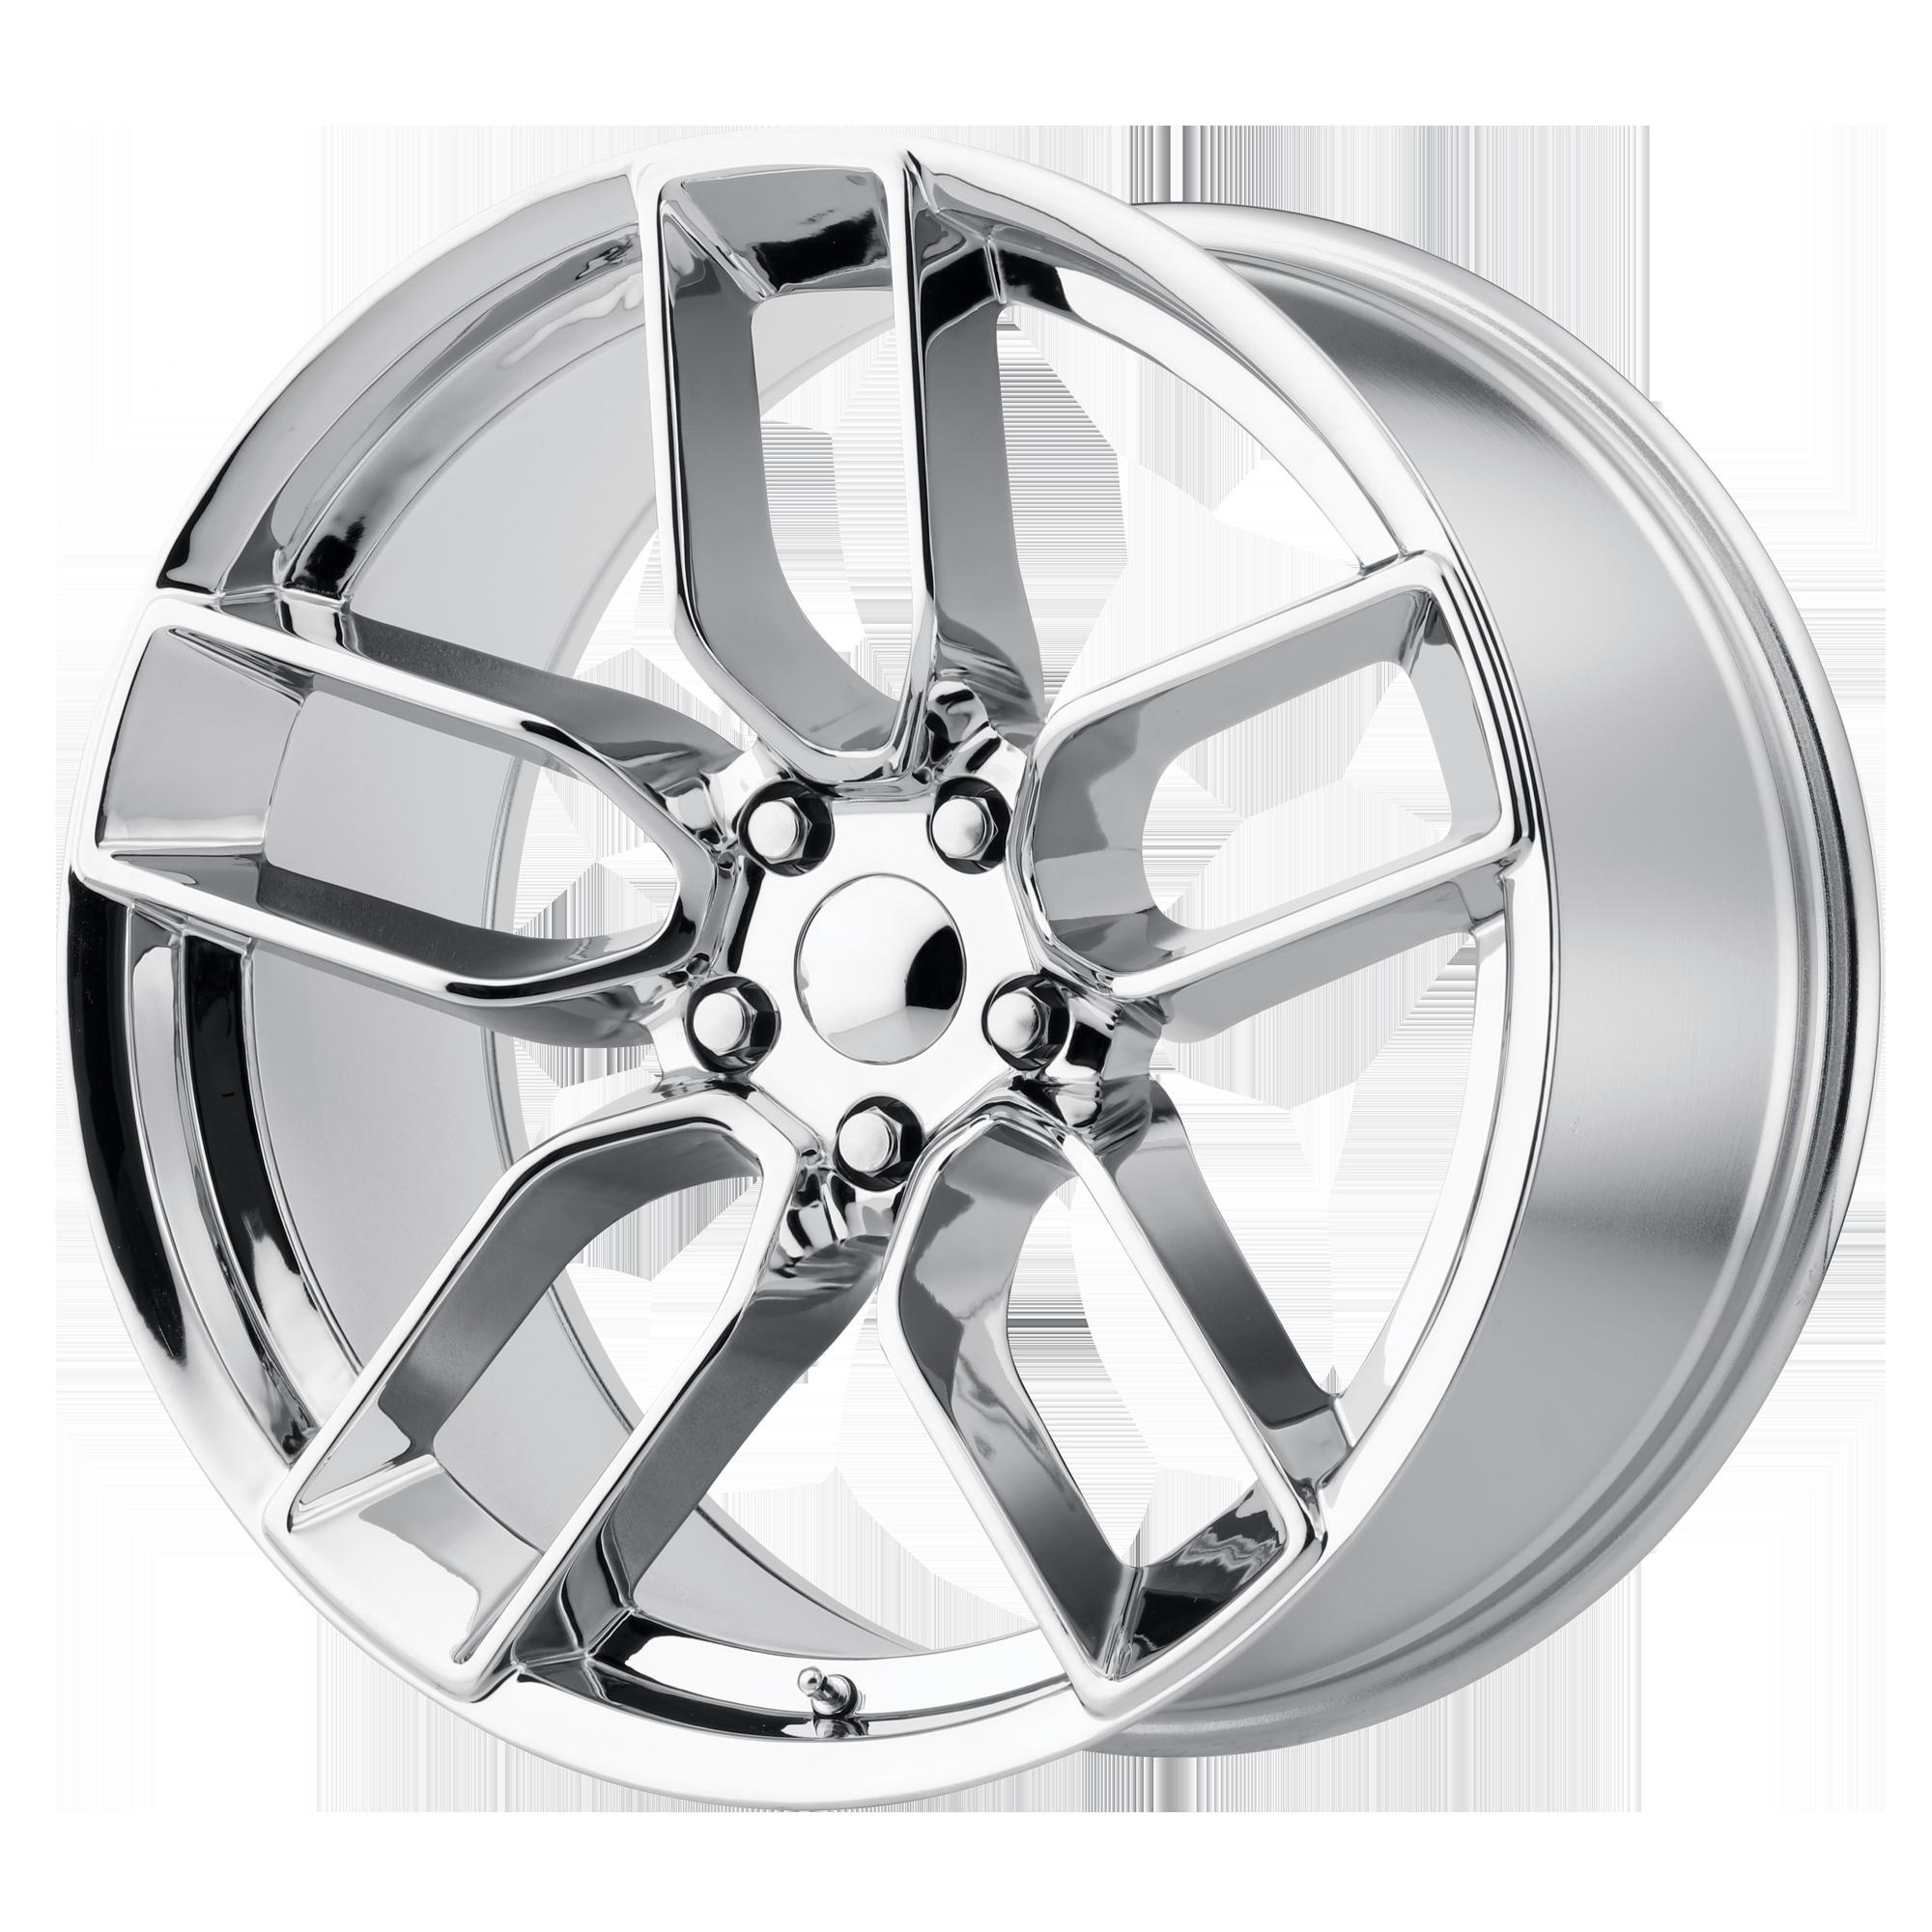 OE Creations Replica Wheels OE Creations PR179 Chrome